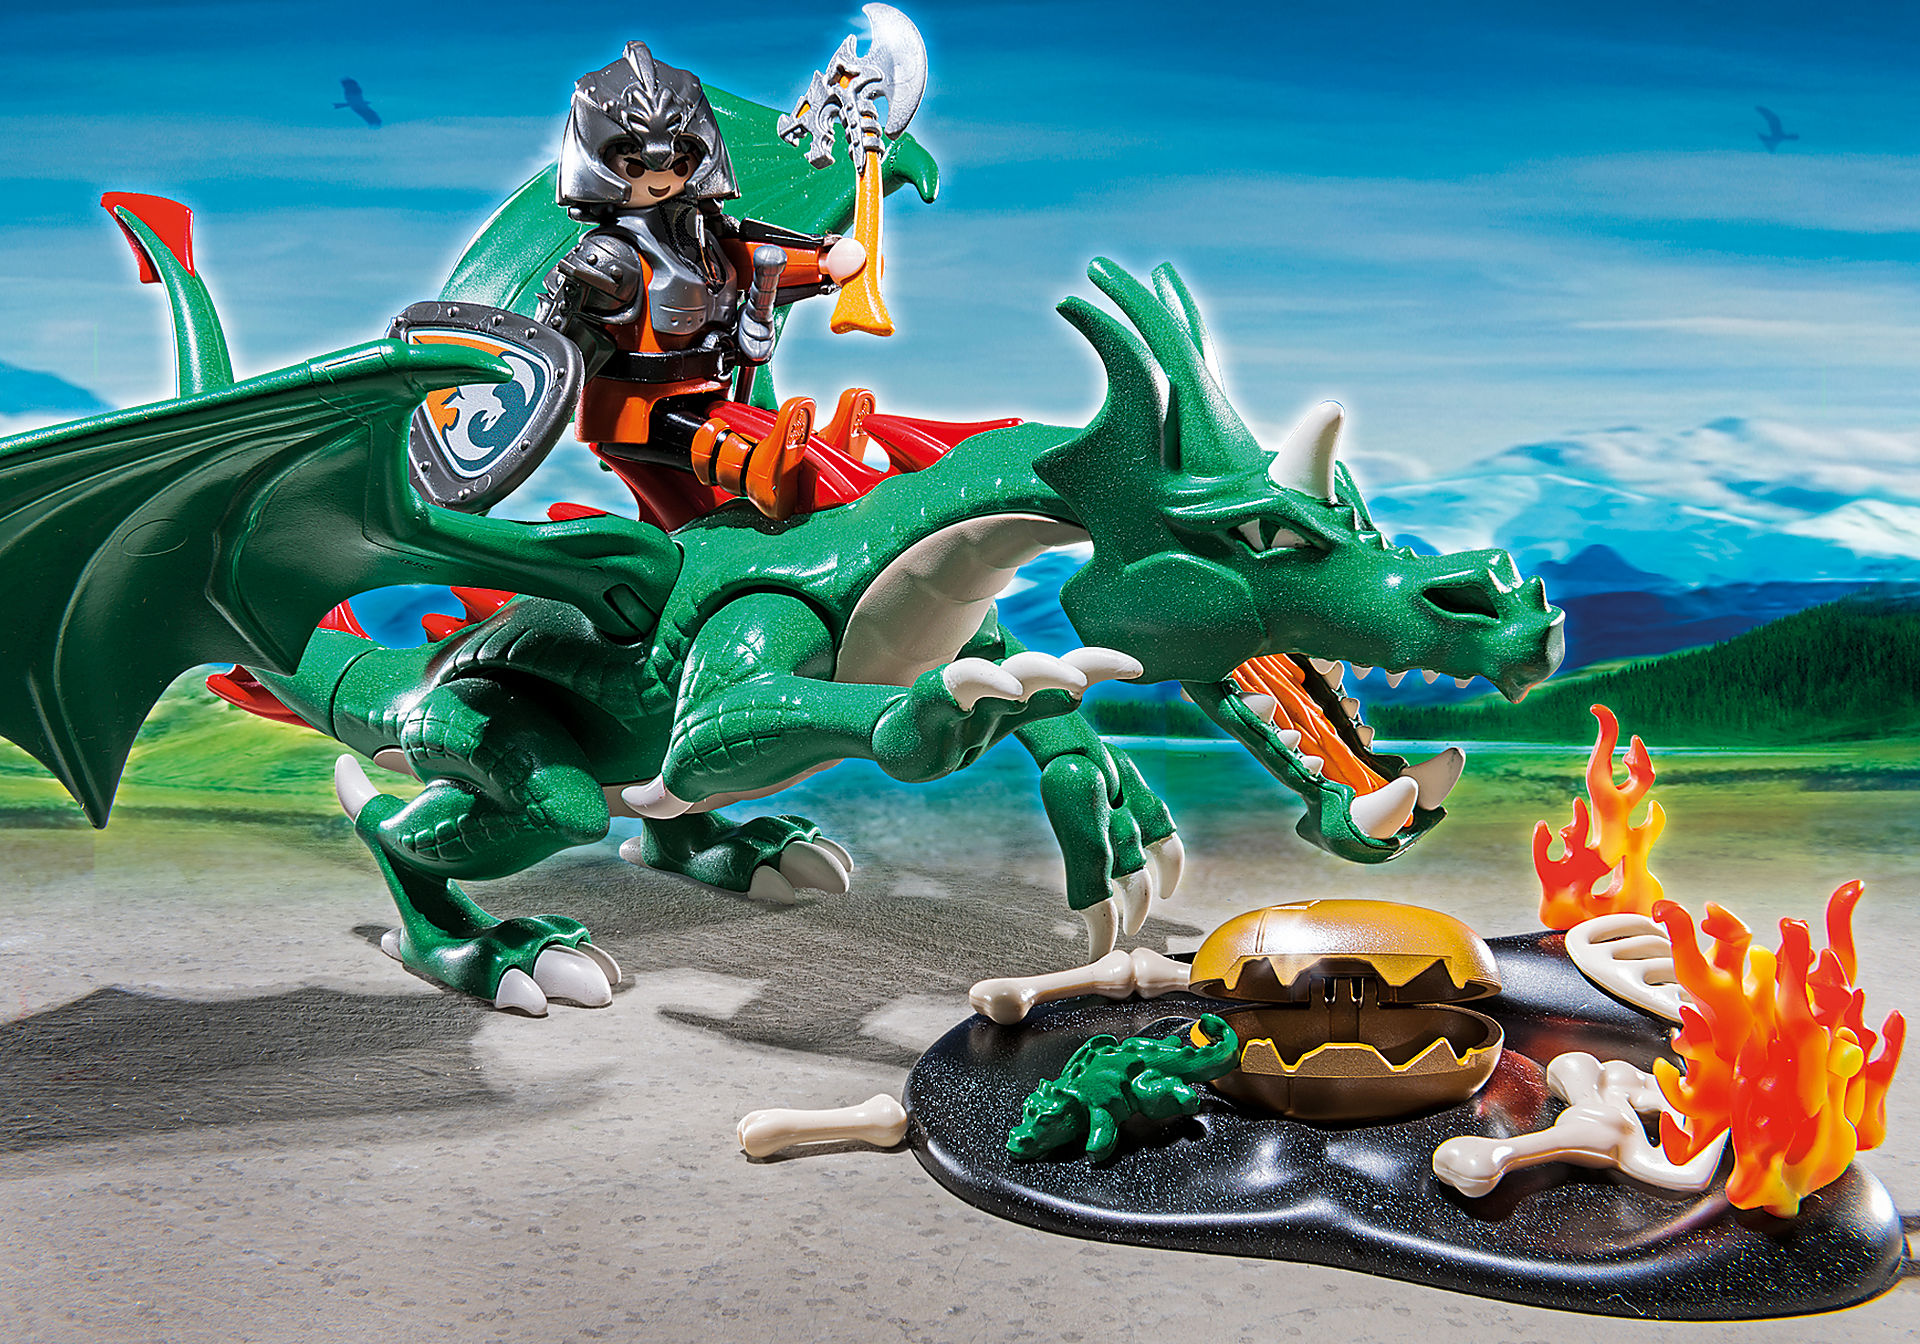 http://media.playmobil.com/i/playmobil/6003_product_extra1/Chevalier avec grand dragon vert